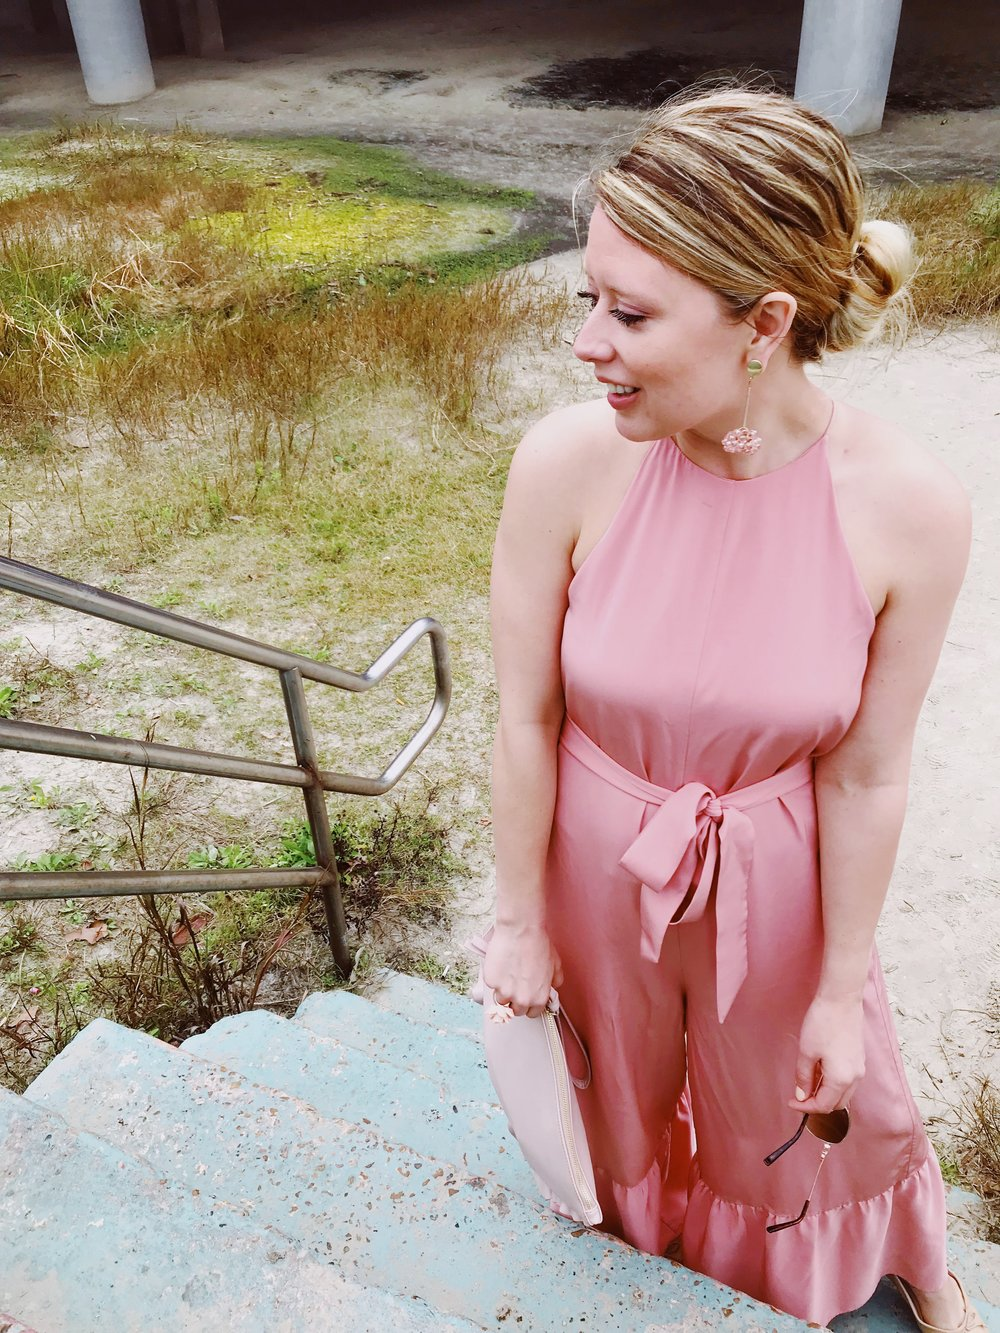 Three Heel Clicks - Trend to Watch - The Pink Jumpsuit (24).jpg